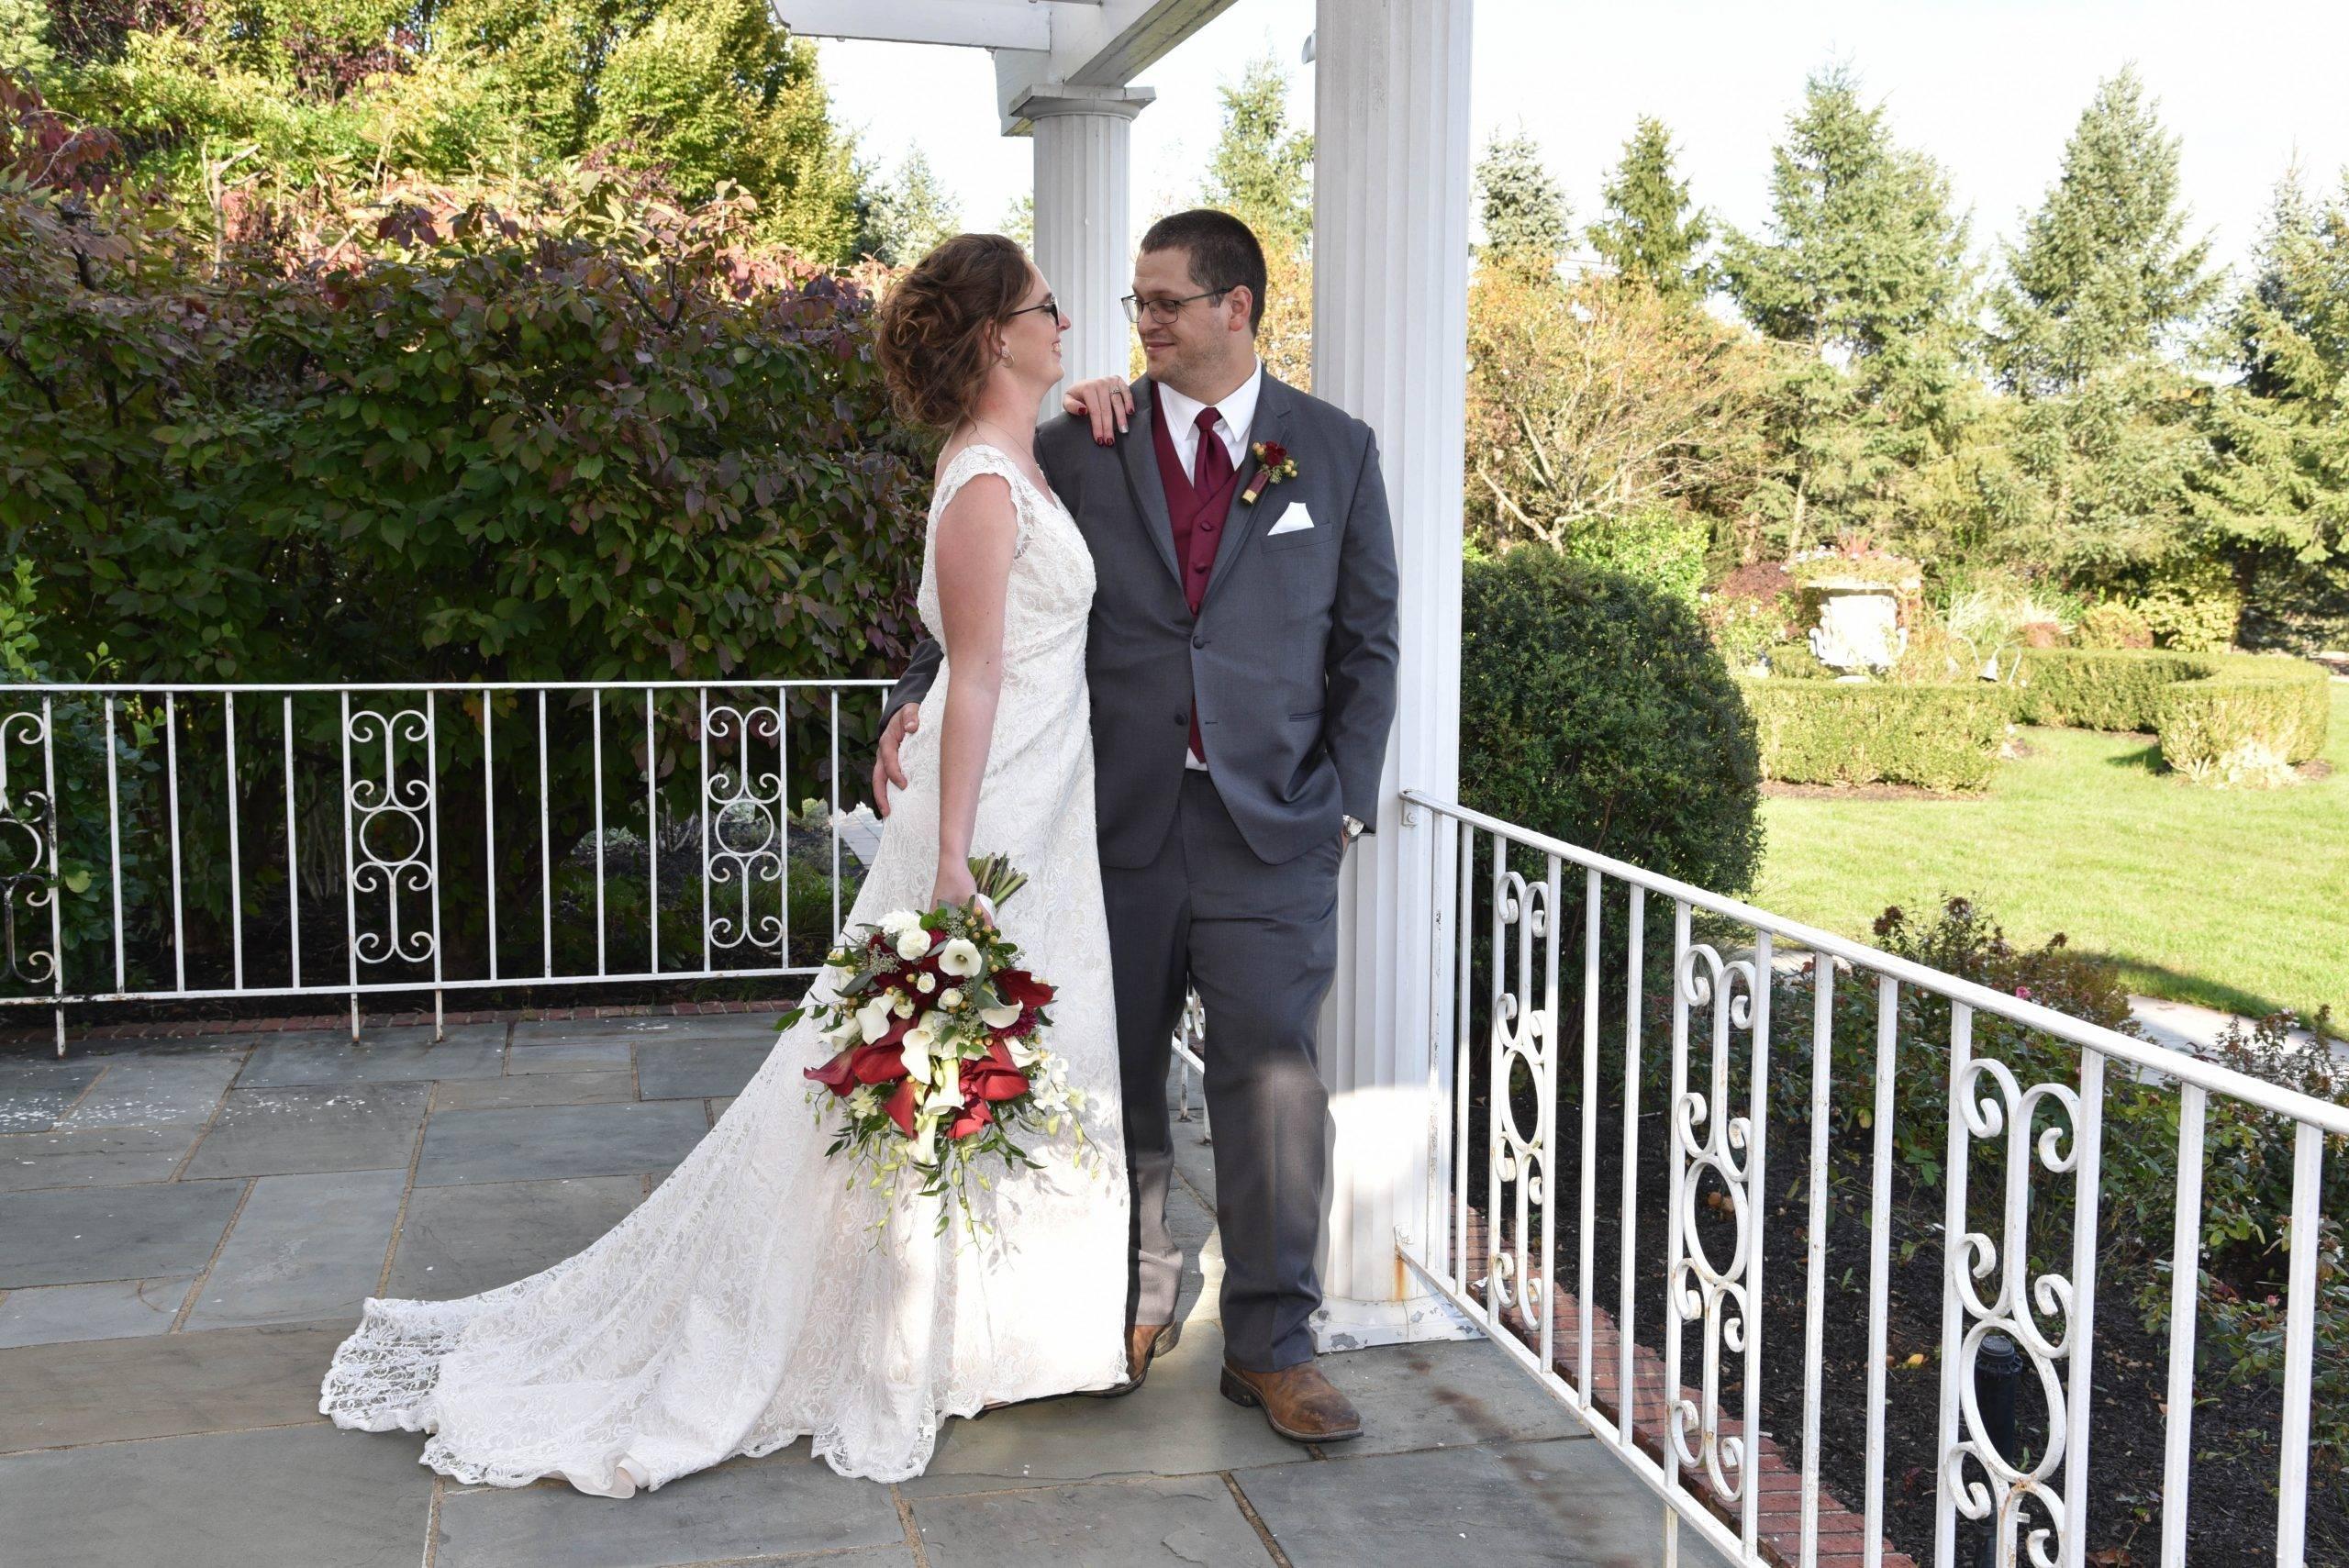 Birchwood Manor bride & groom